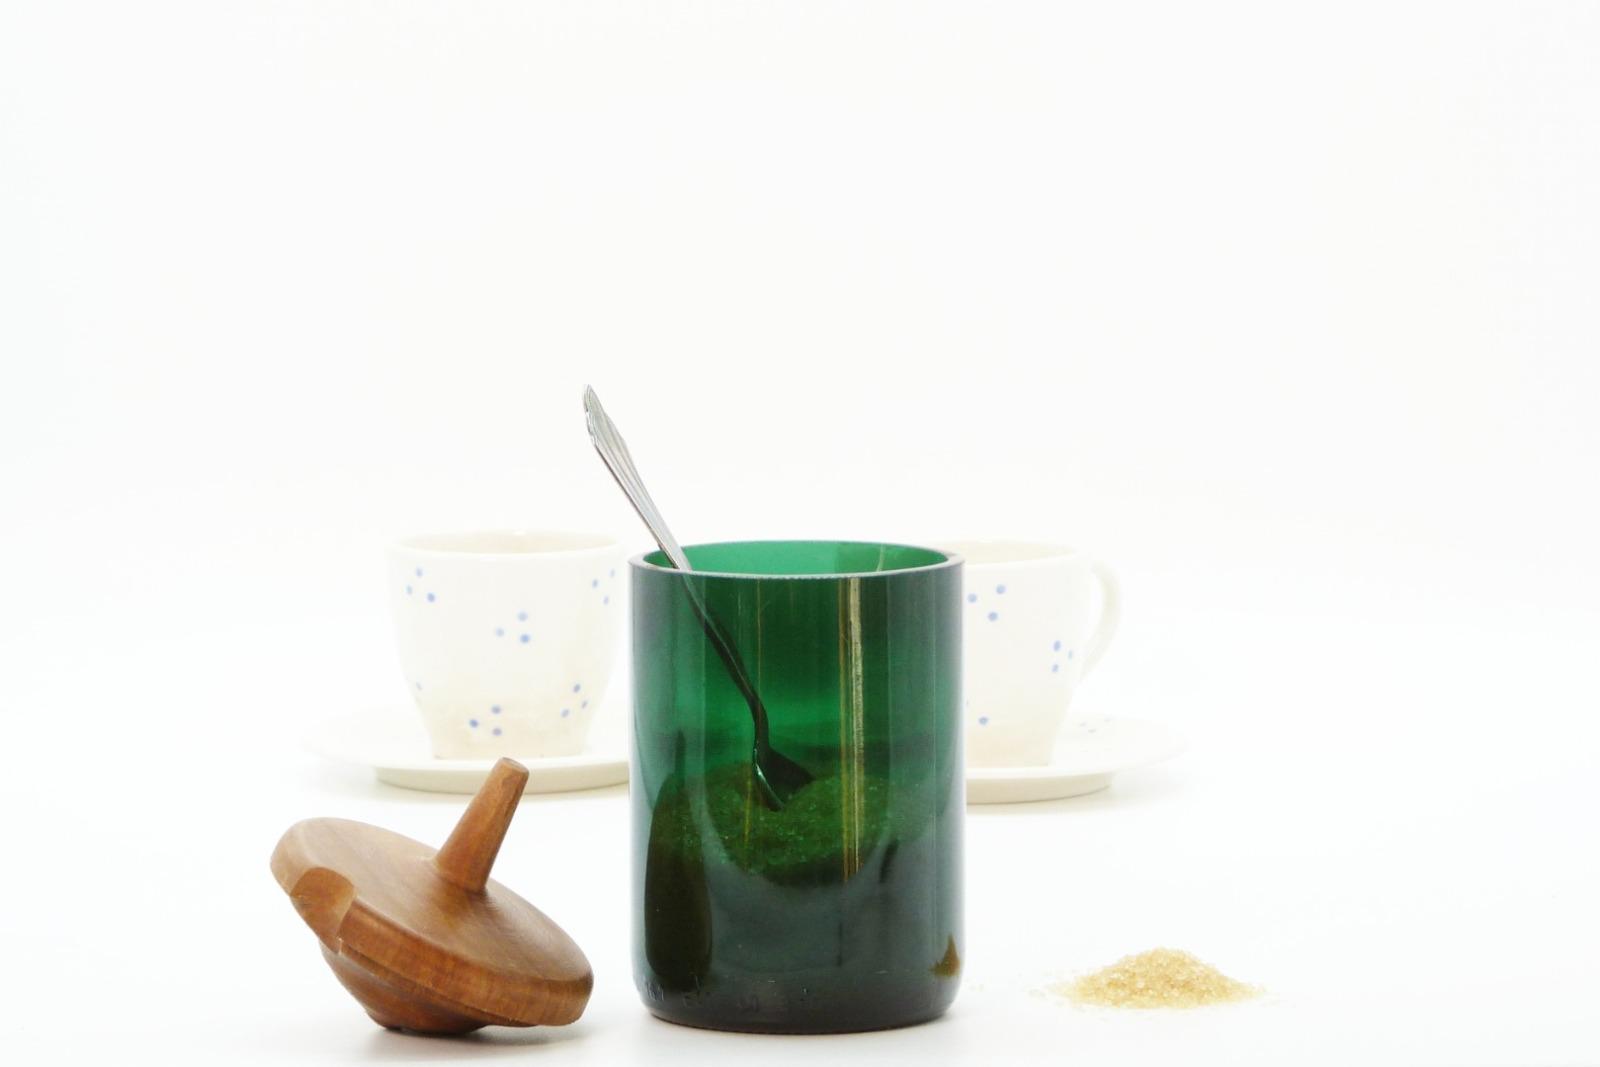 Zuckerdose aus Recyclingglas 5